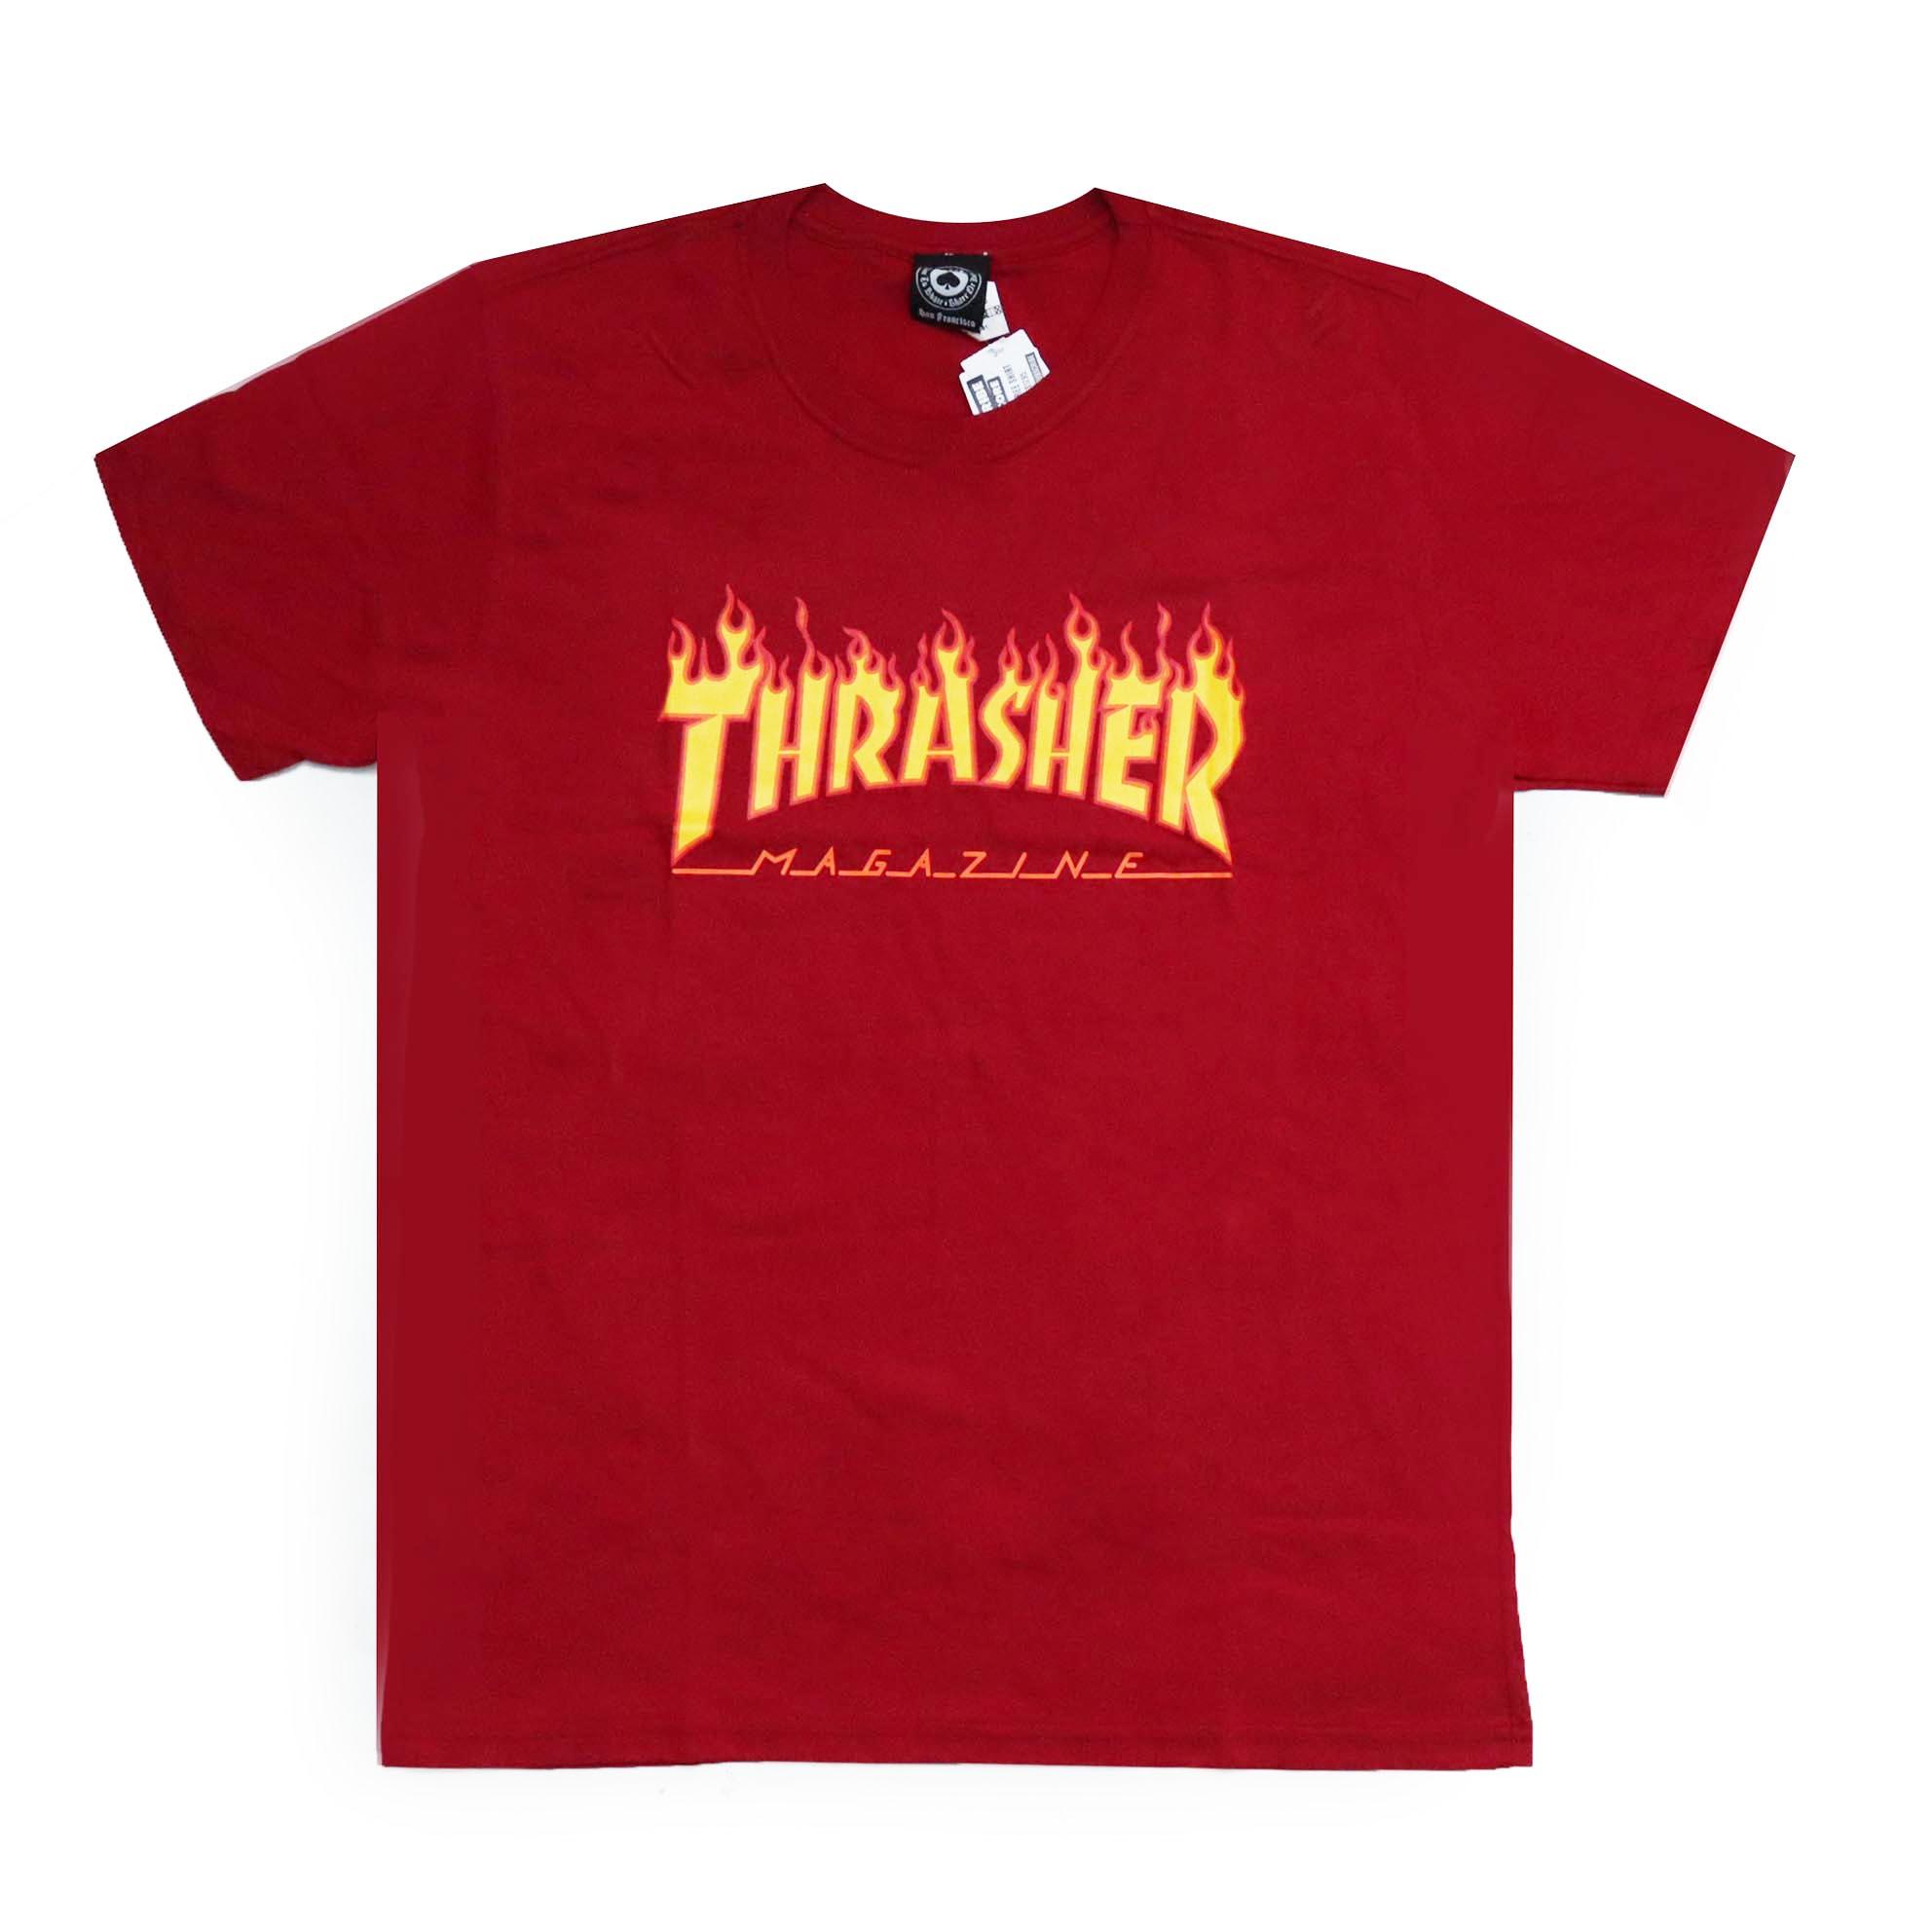 Camiseta Thrasher Magazine Classic Flame - Vermelho Bordô